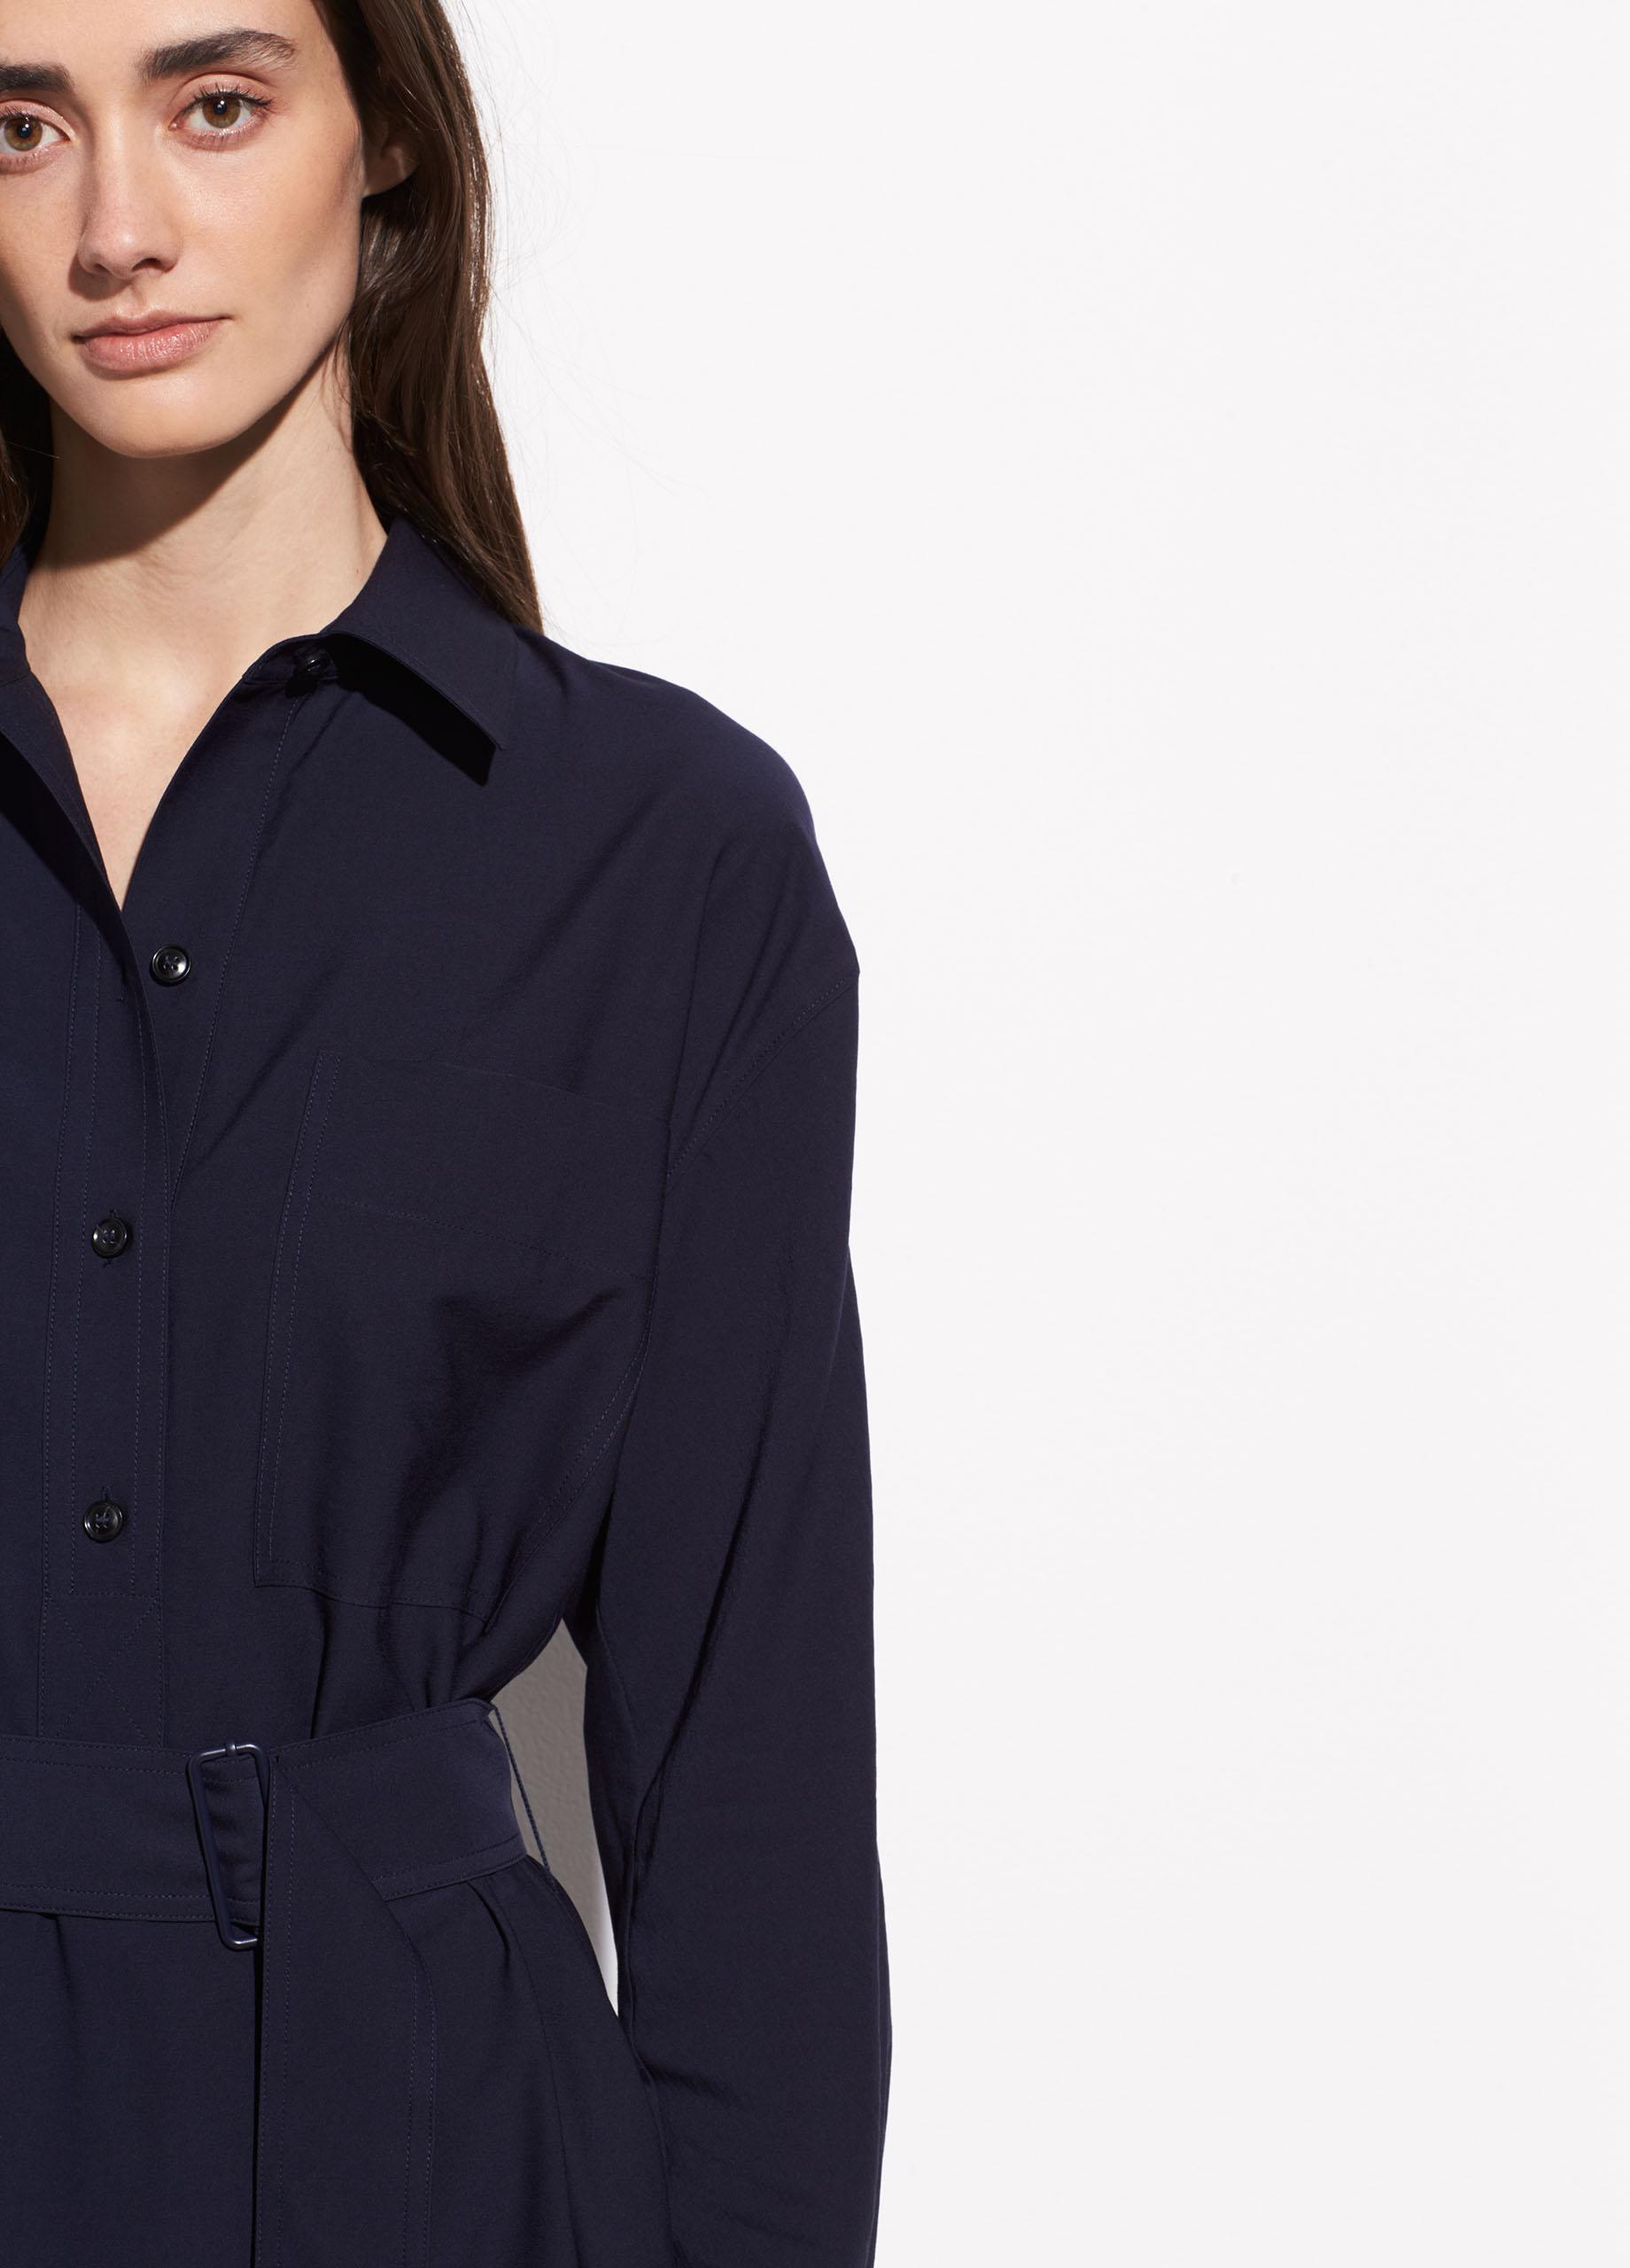 e005dfee42d0c8 Lyst - Vince Long Sleeve Utility Shirt Dress in Blue